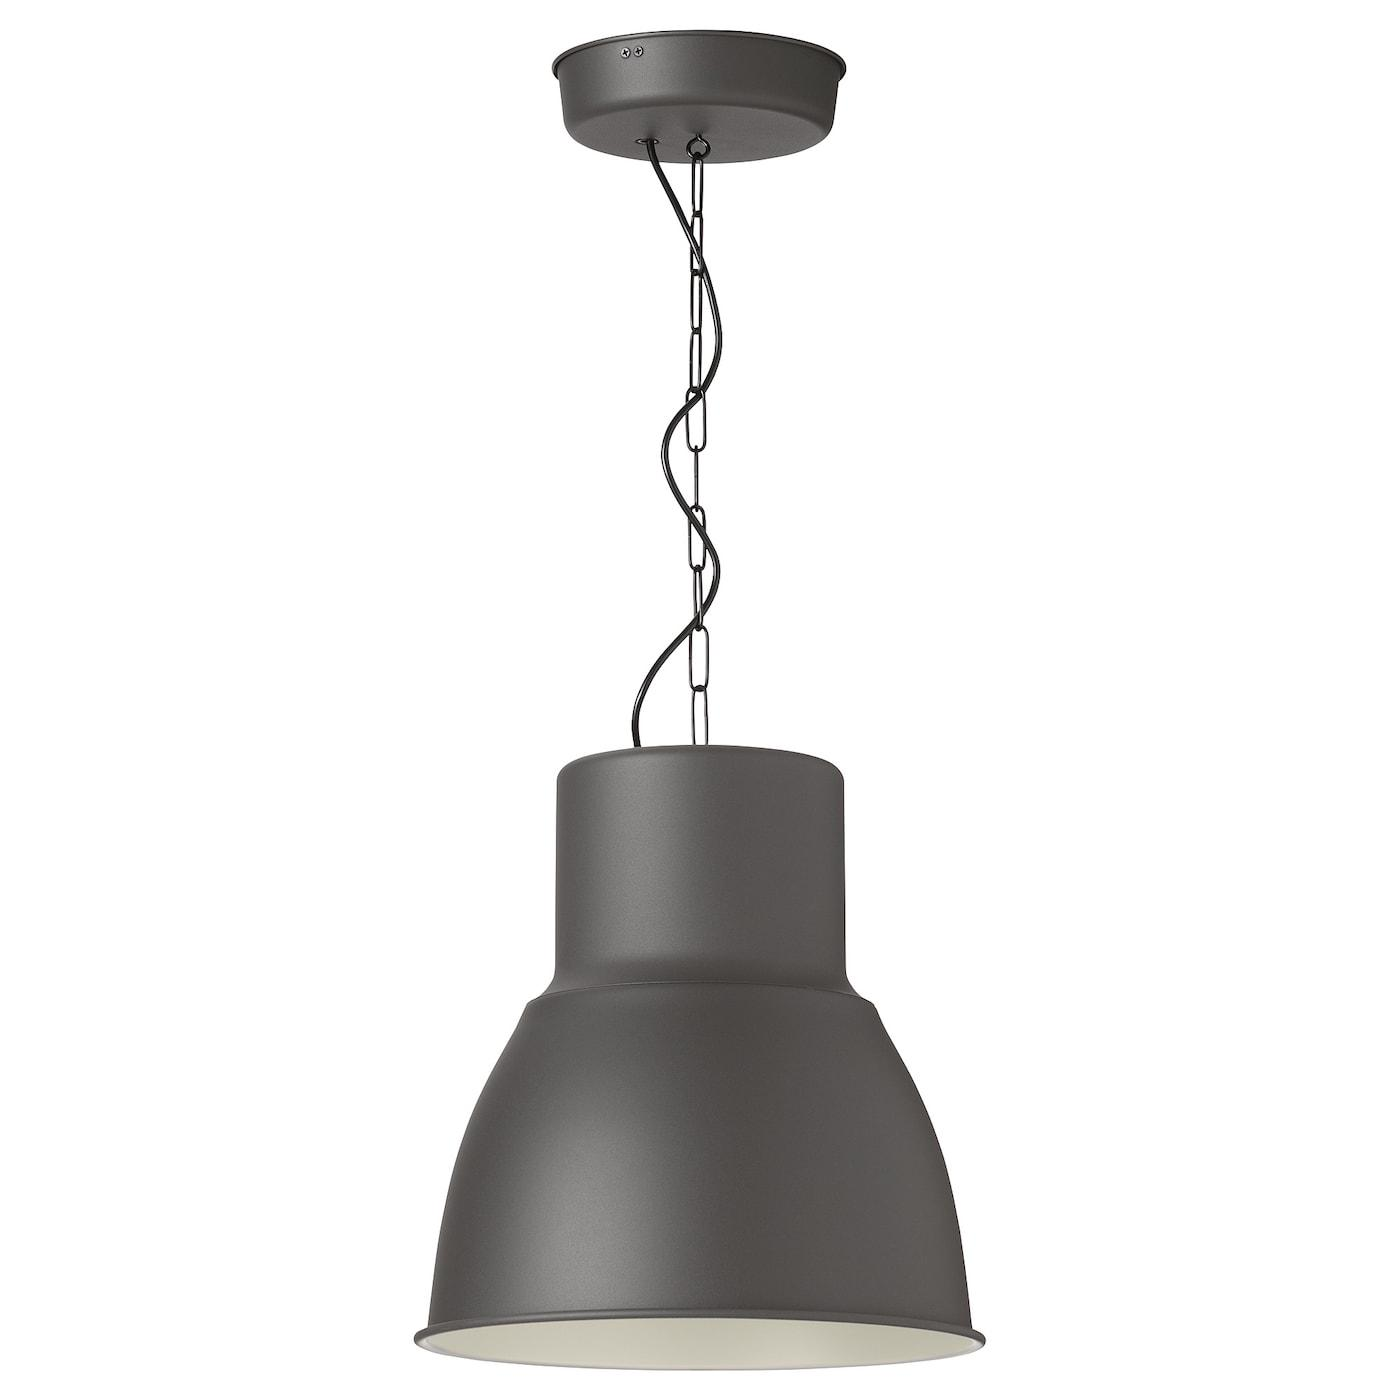 Ikea Lampe Schwarz Metall